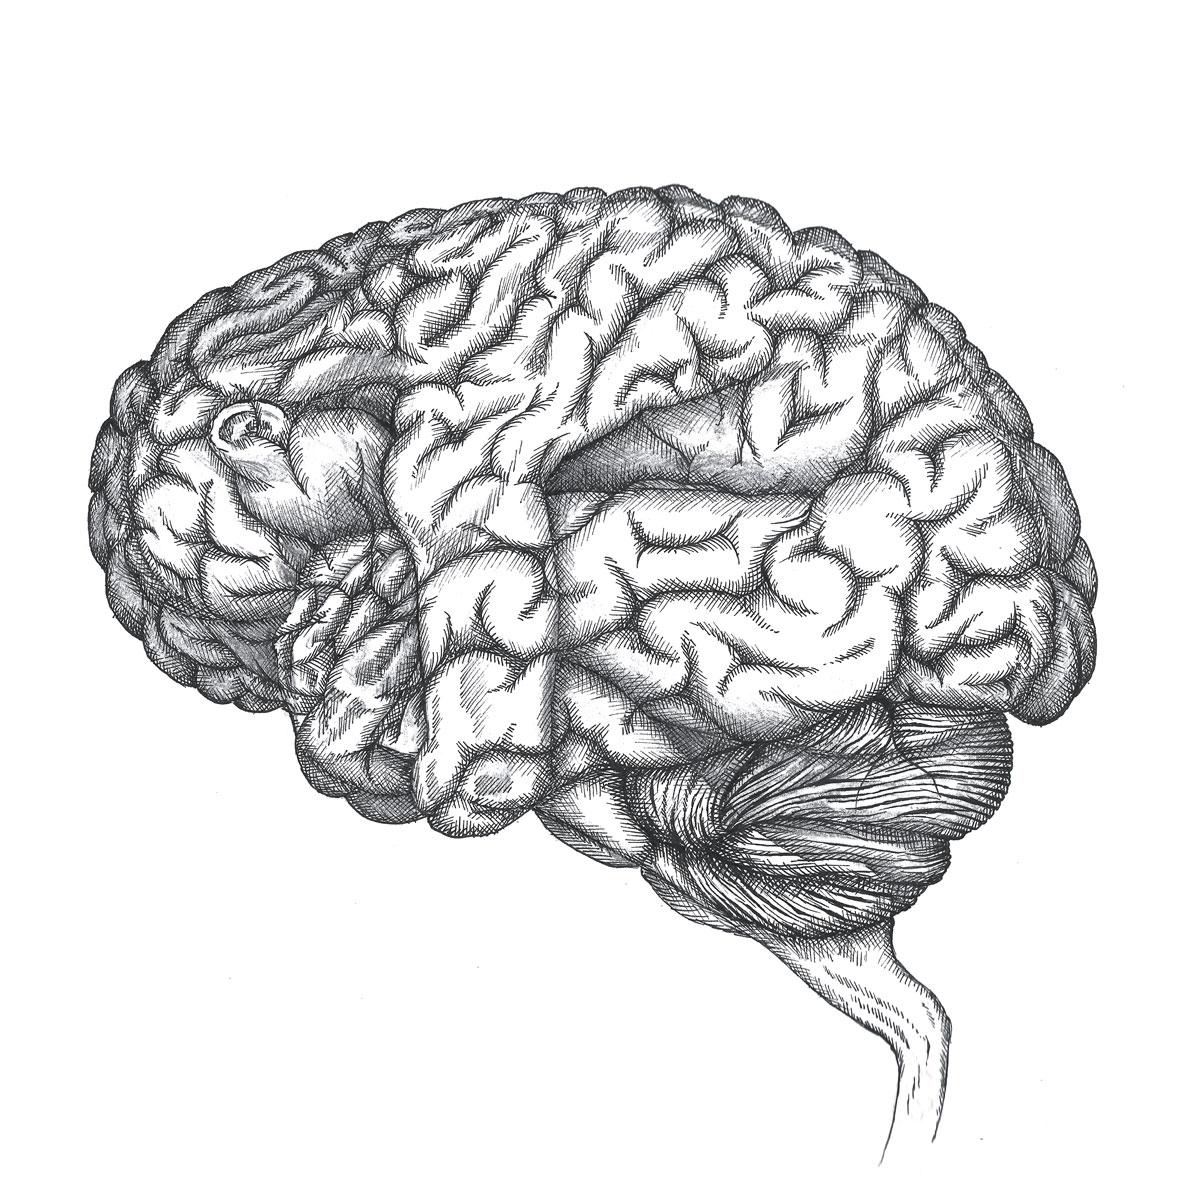 Fetal Brain illustration by Zach Johnson